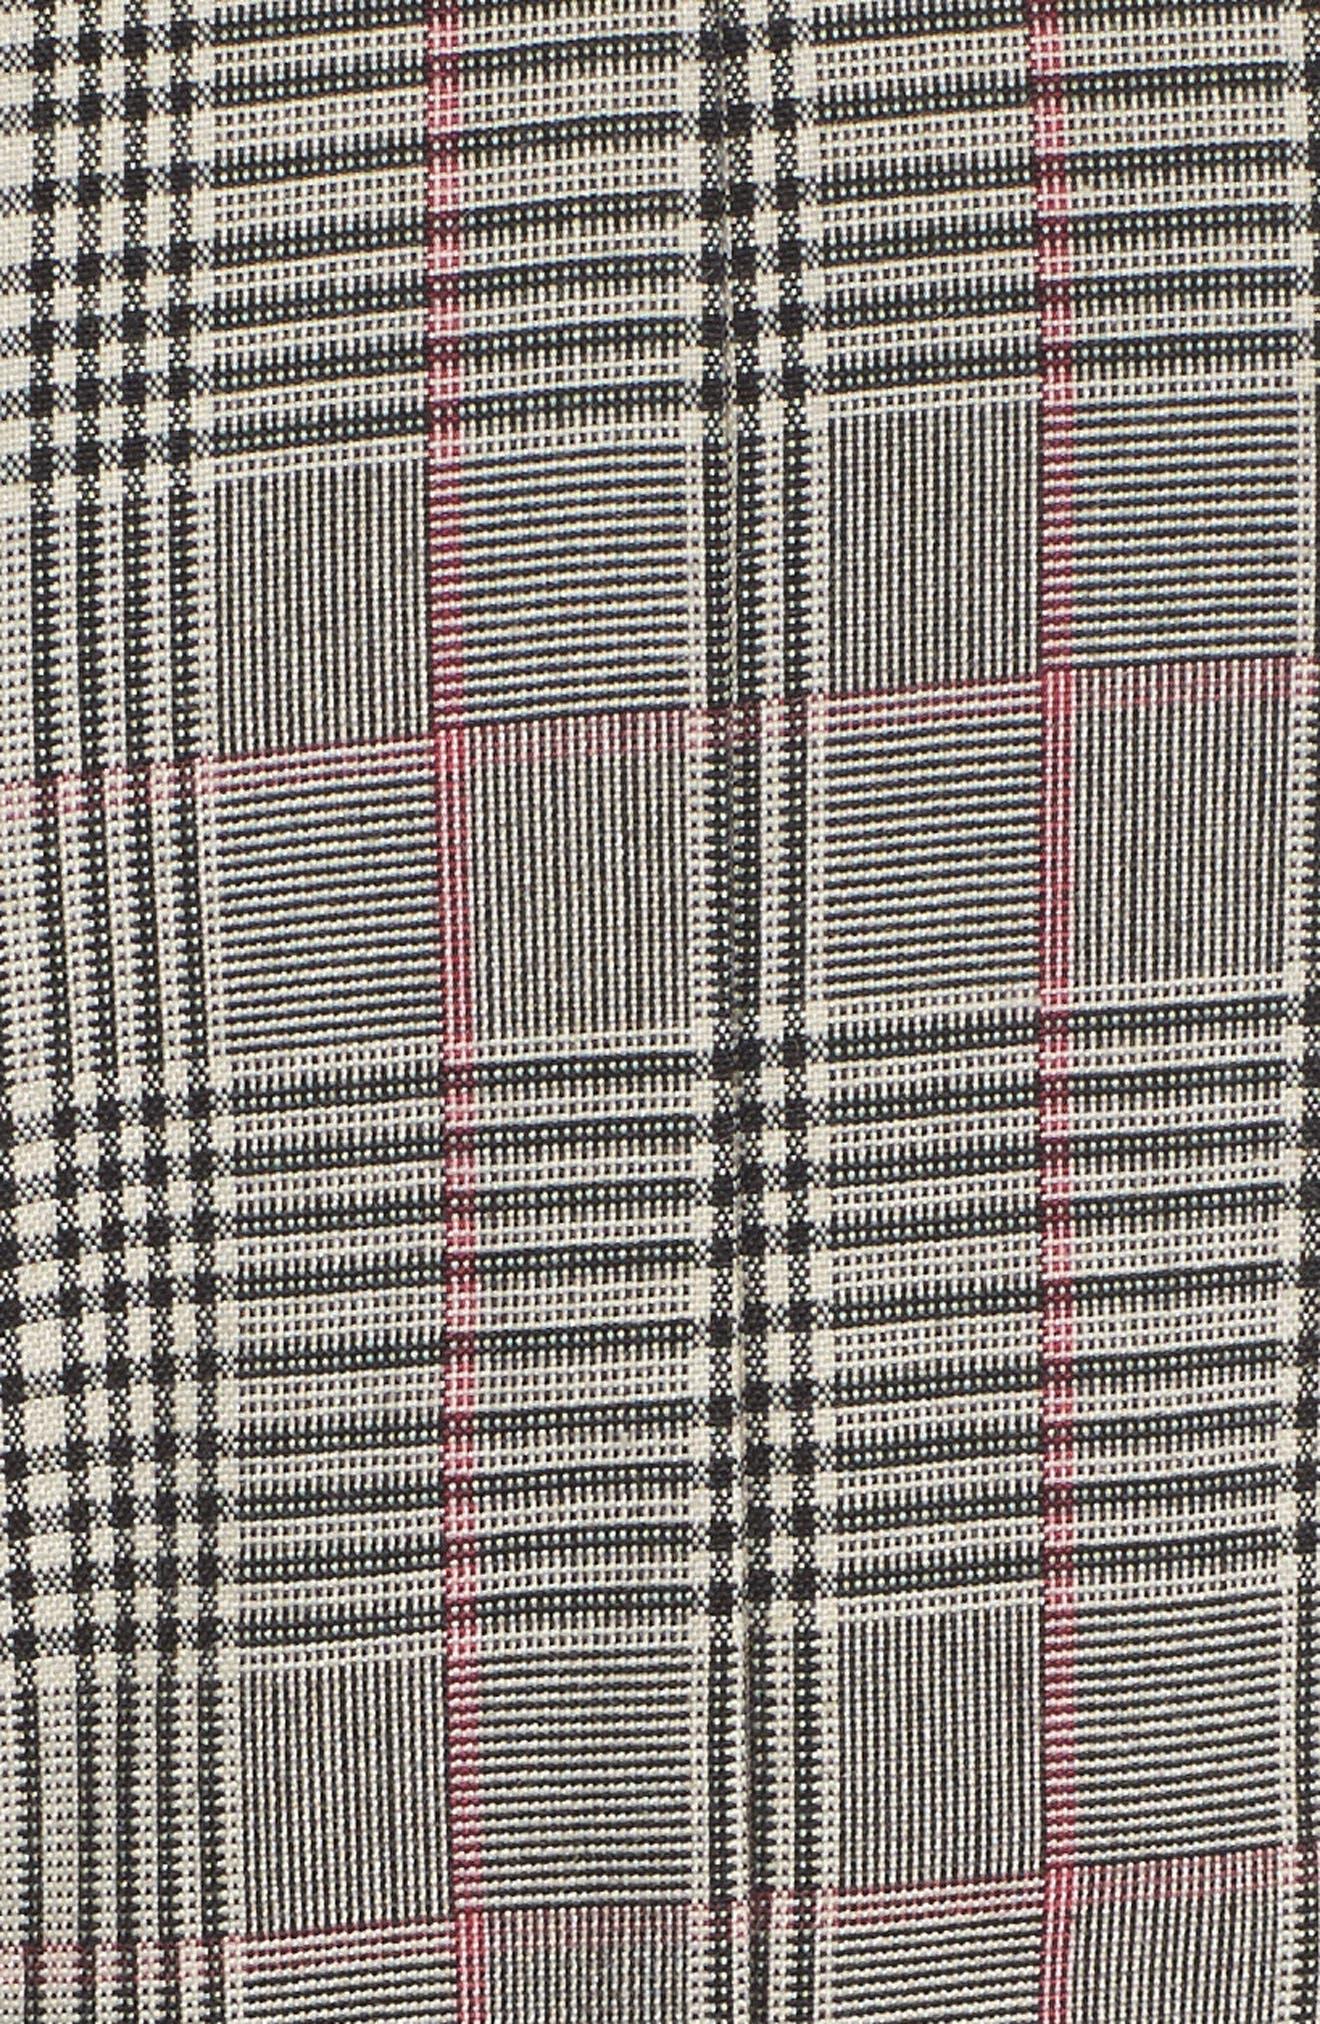 Aurora Plaid Tie Sheath,                             Alternate thumbnail 5, color,                             Black/ Grey/ Red